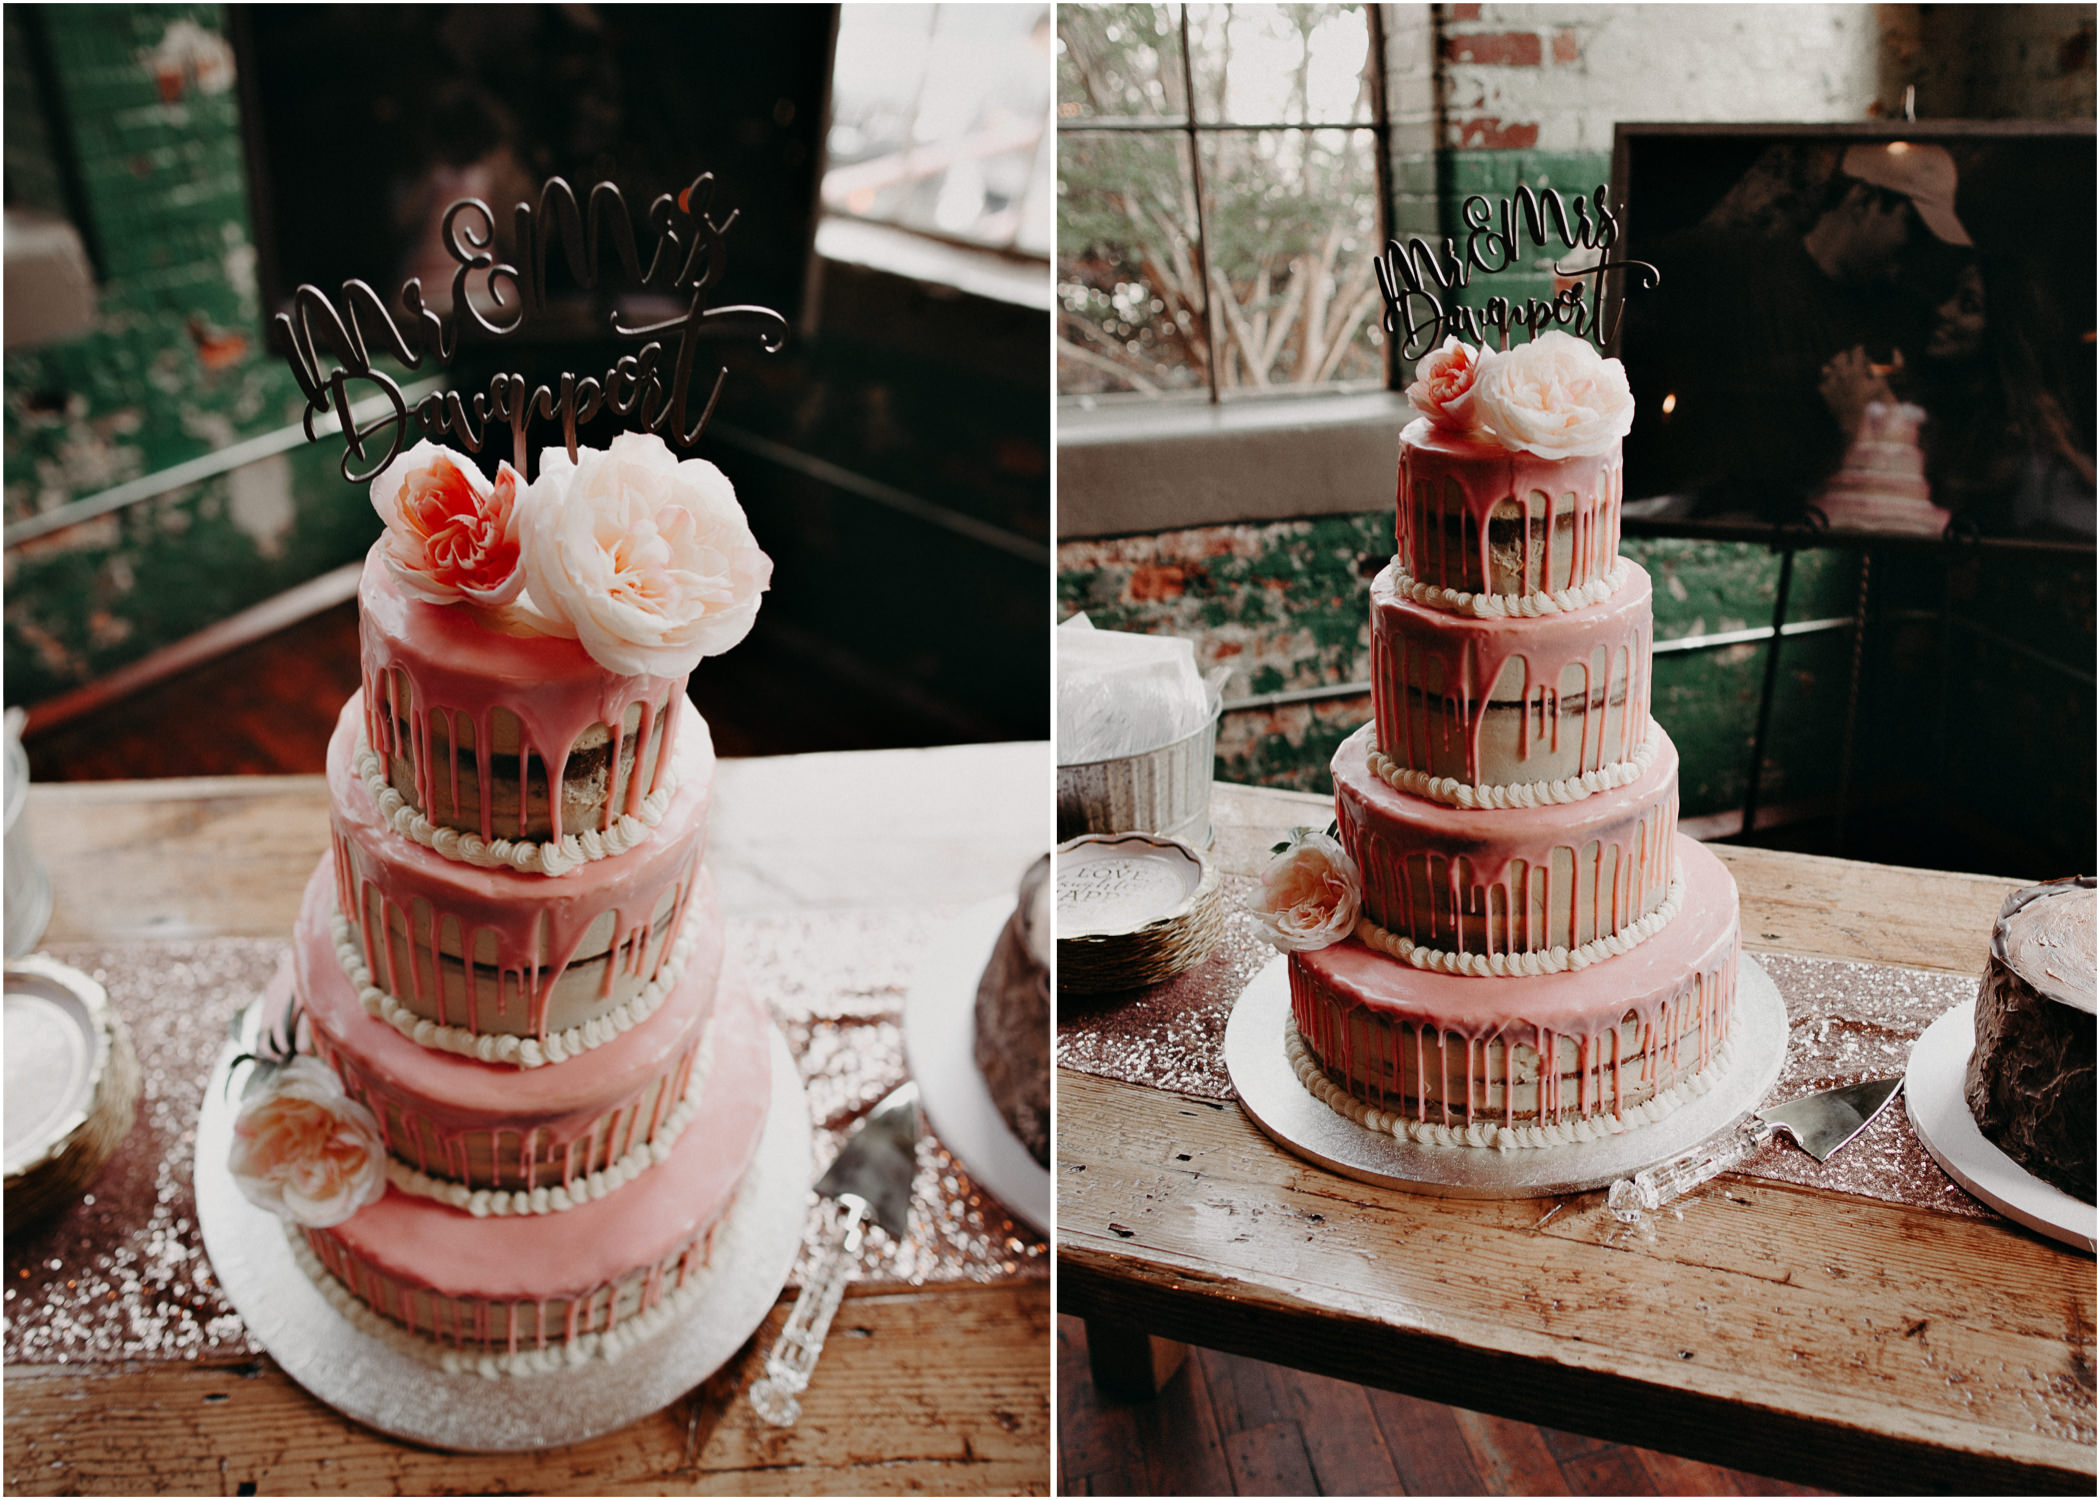 39 4 - Atlanta Wedding Photographer - The engine room - Ga - Wedding trends - Aline Marin Photography.jpg